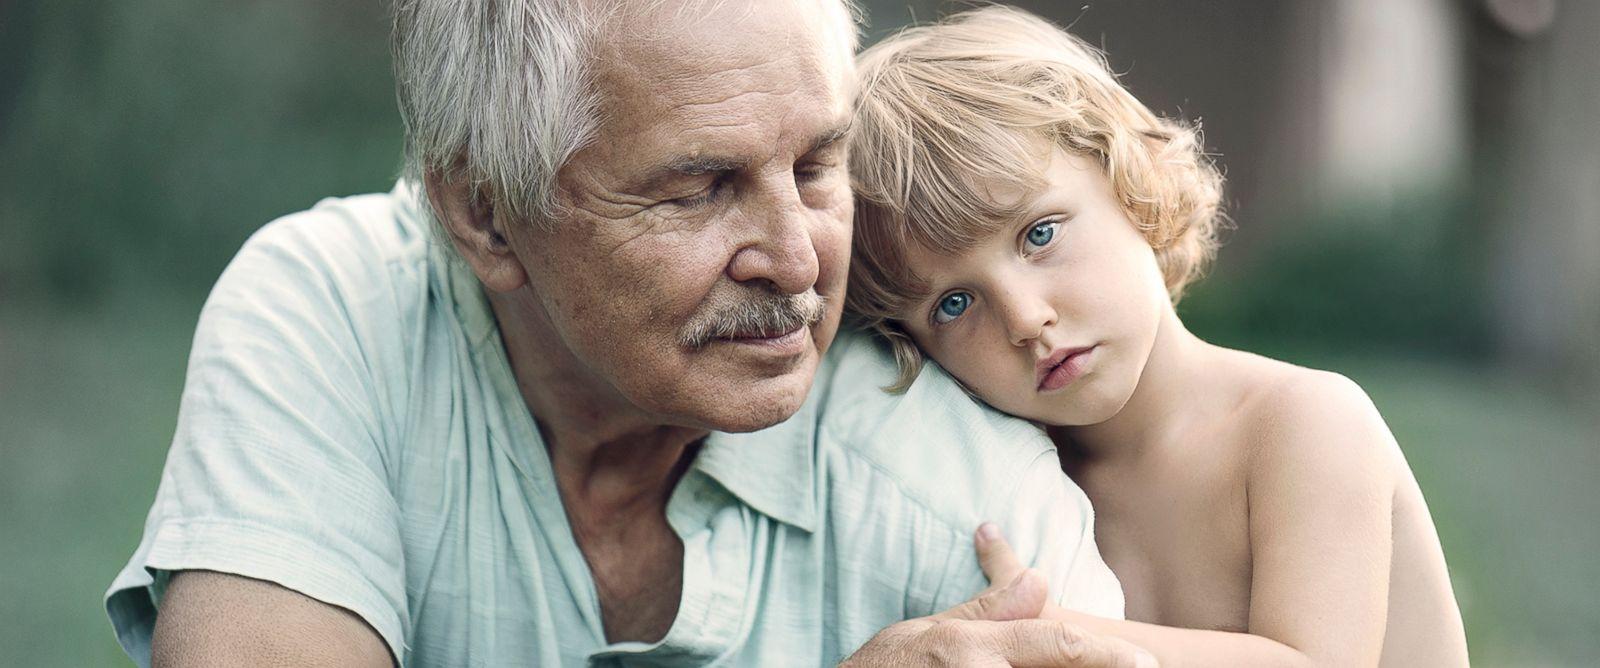 PHOTO: Photographer Ivette Ivens captures the bond between grandparents and grandchildren in her new series Generations.